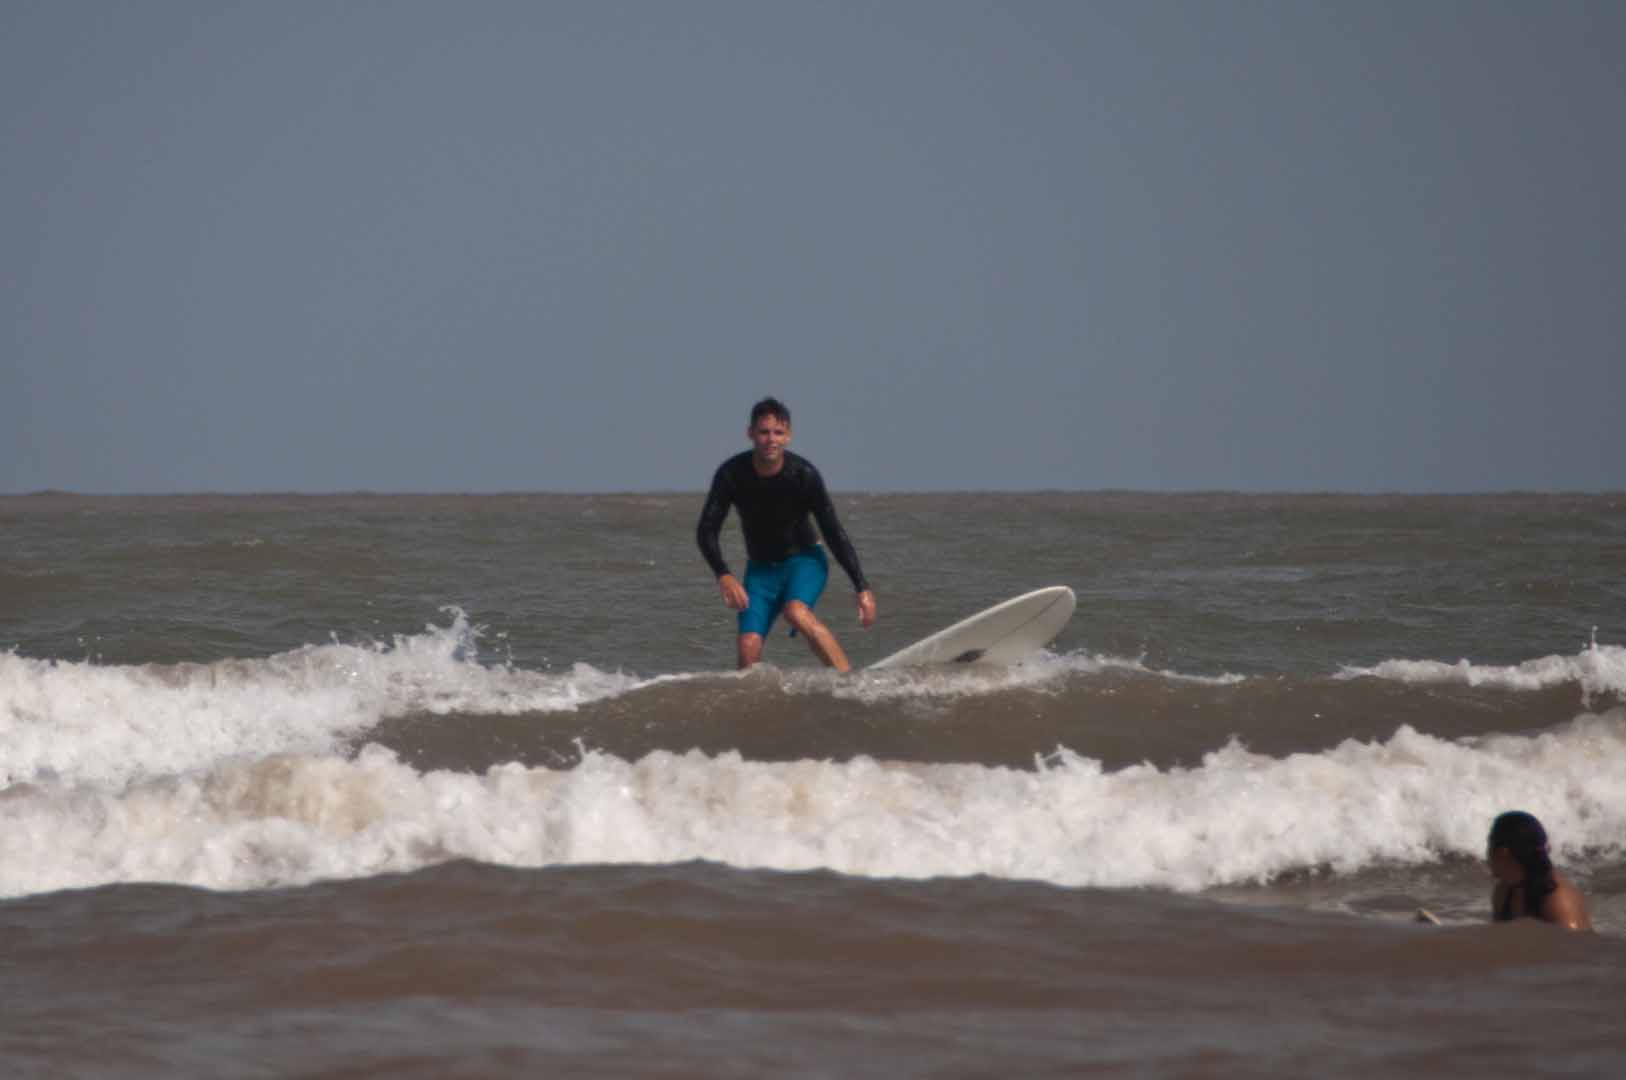 SurfsideJuly2_20150702_128